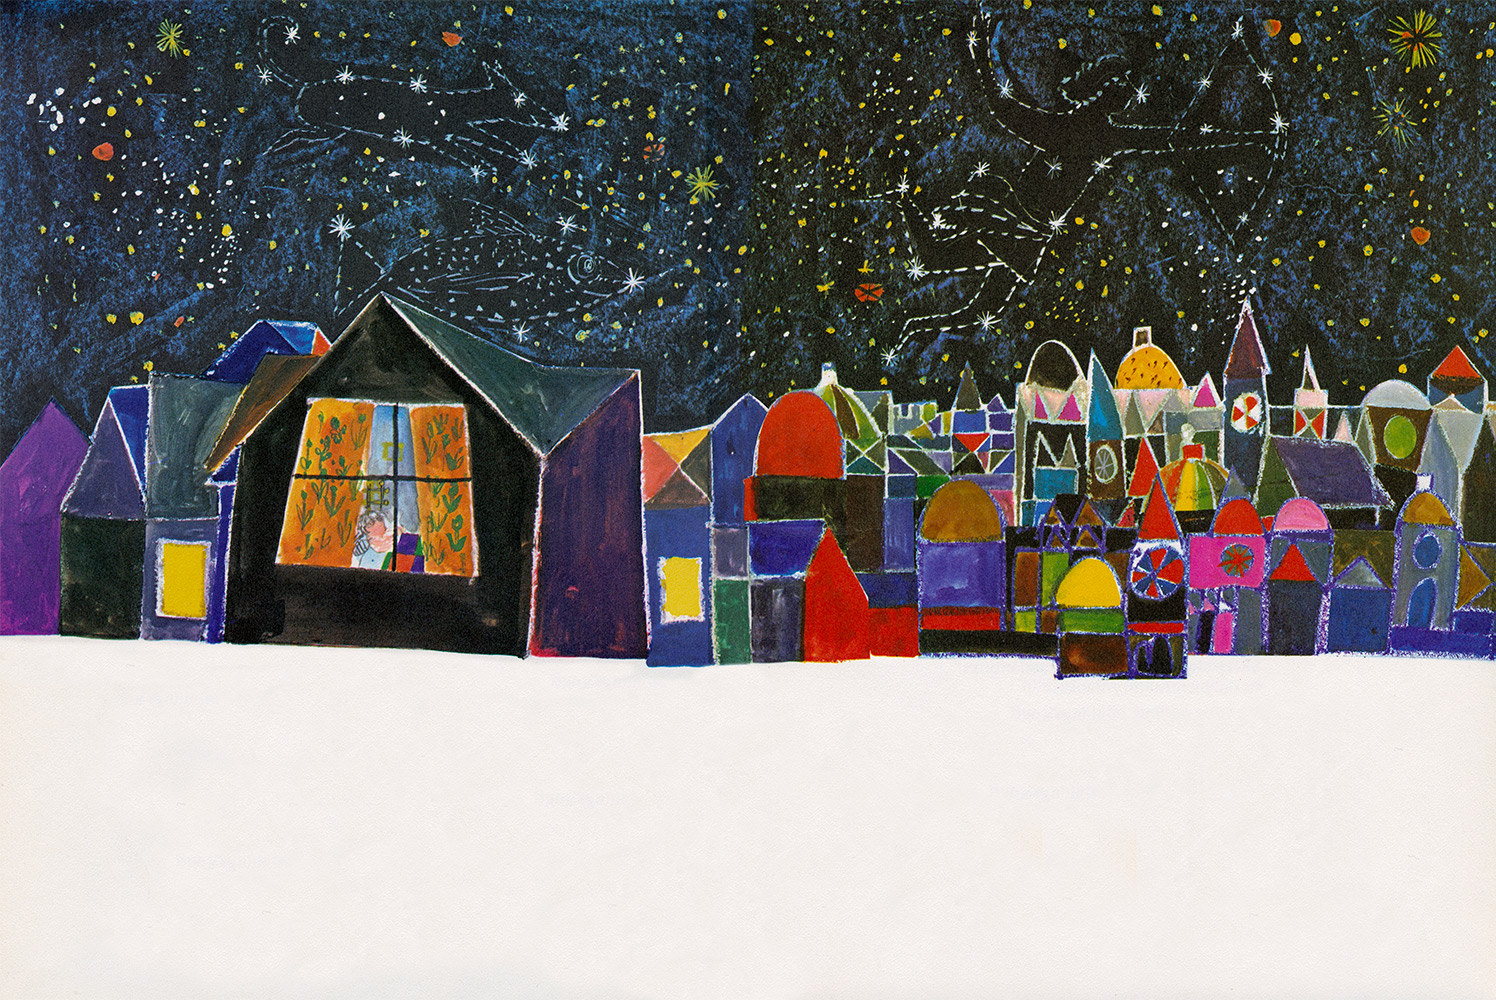 Robert-Louis-Stevenson-a-childs-garden-of-verses-Escape-at-Bedtime-Brian-Wildsmith.jpg